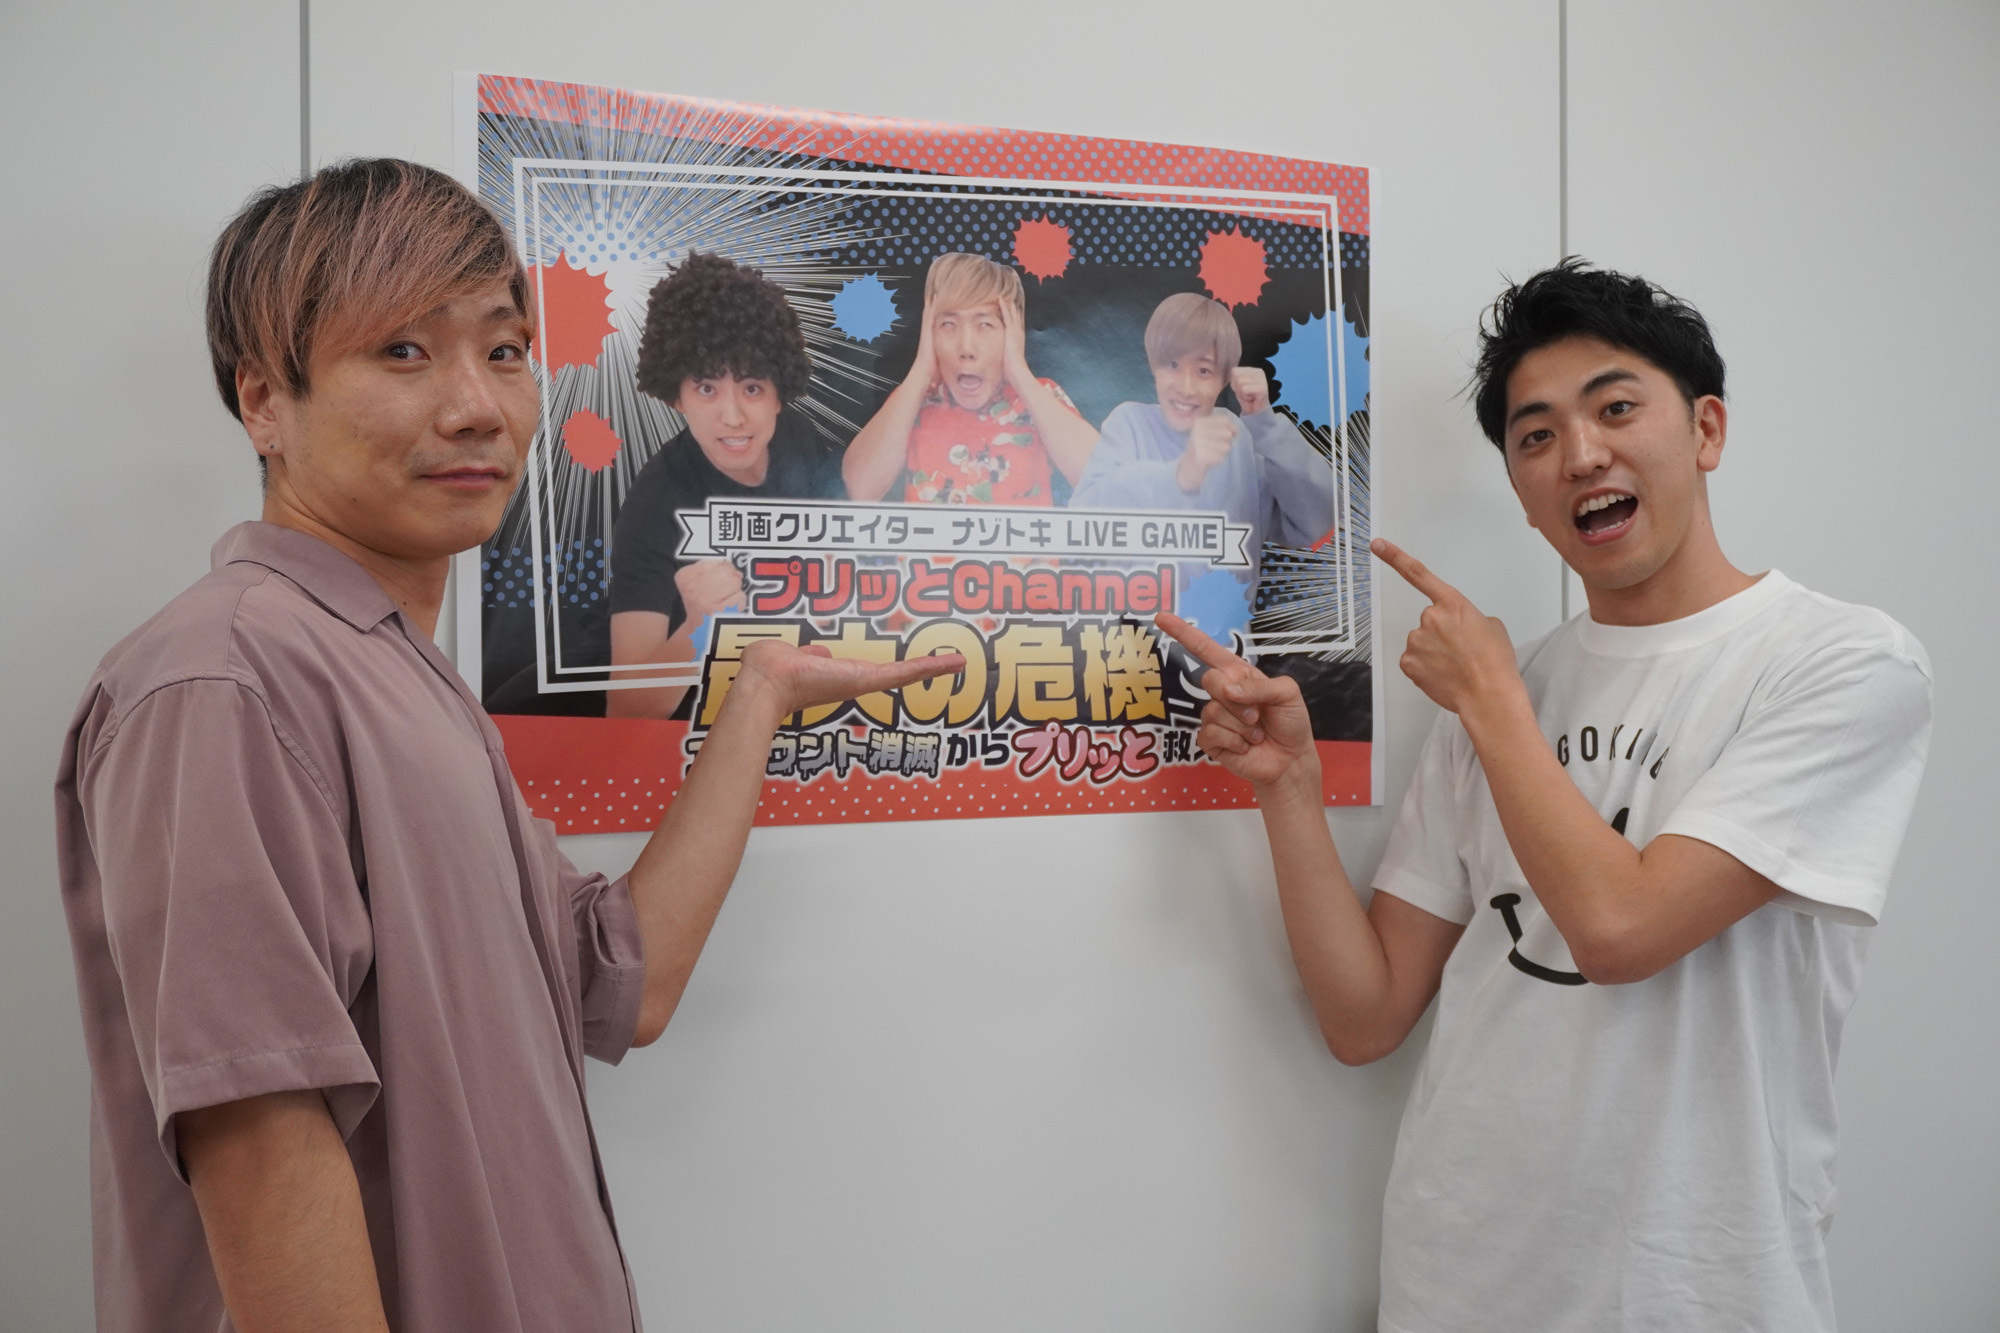 TOP差し替え候補:DSC02694.JPG